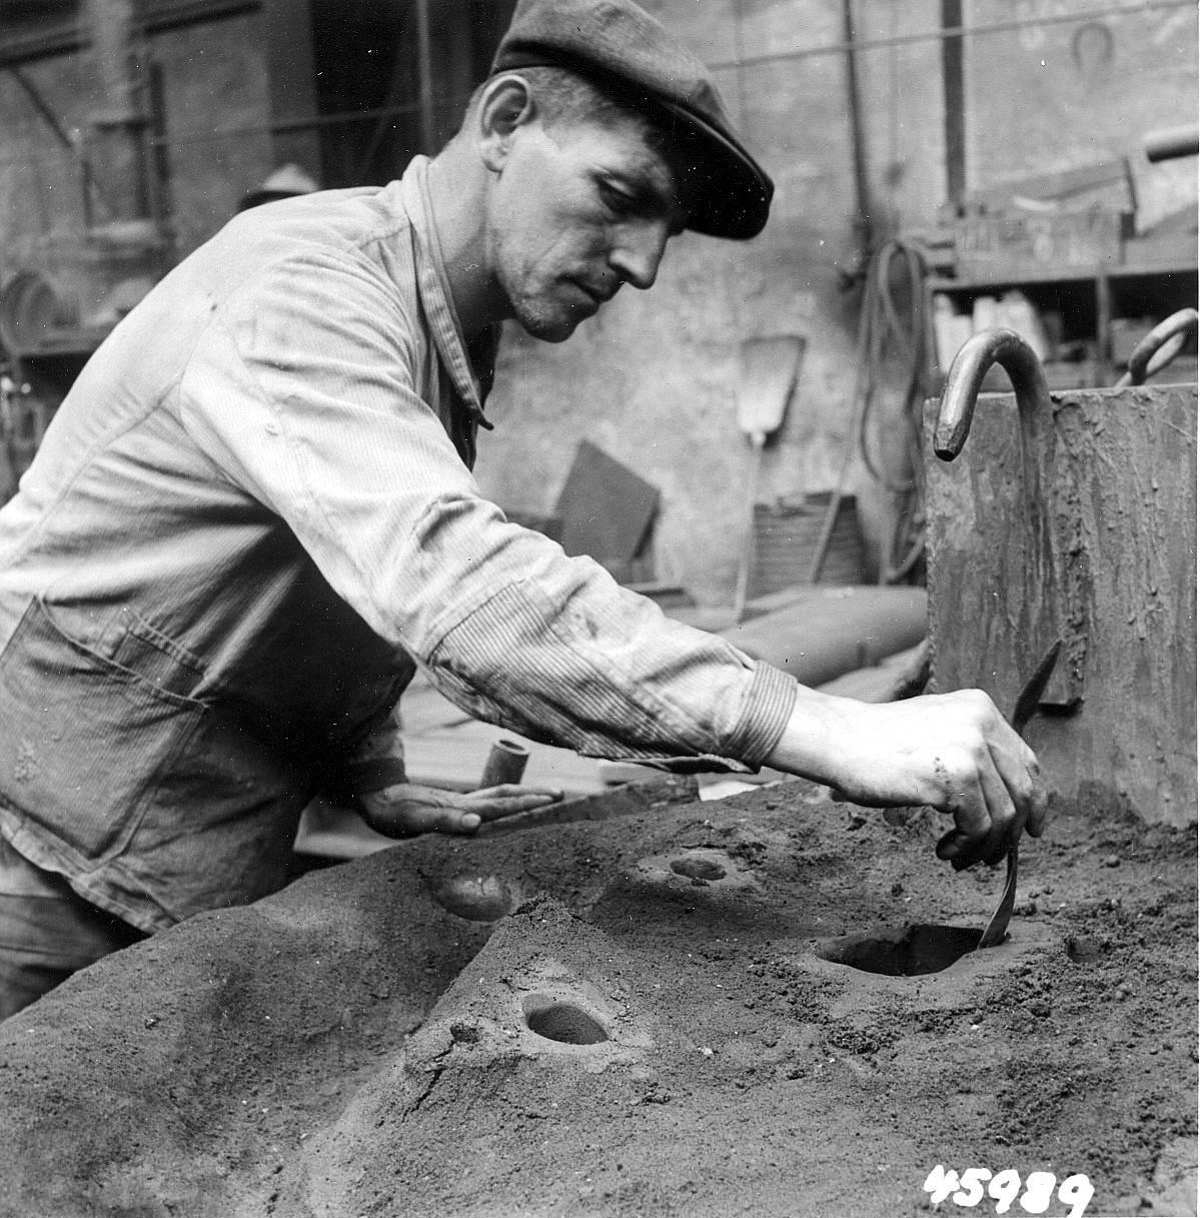 GFA 12/45989: Reportage casting process in malleable casting